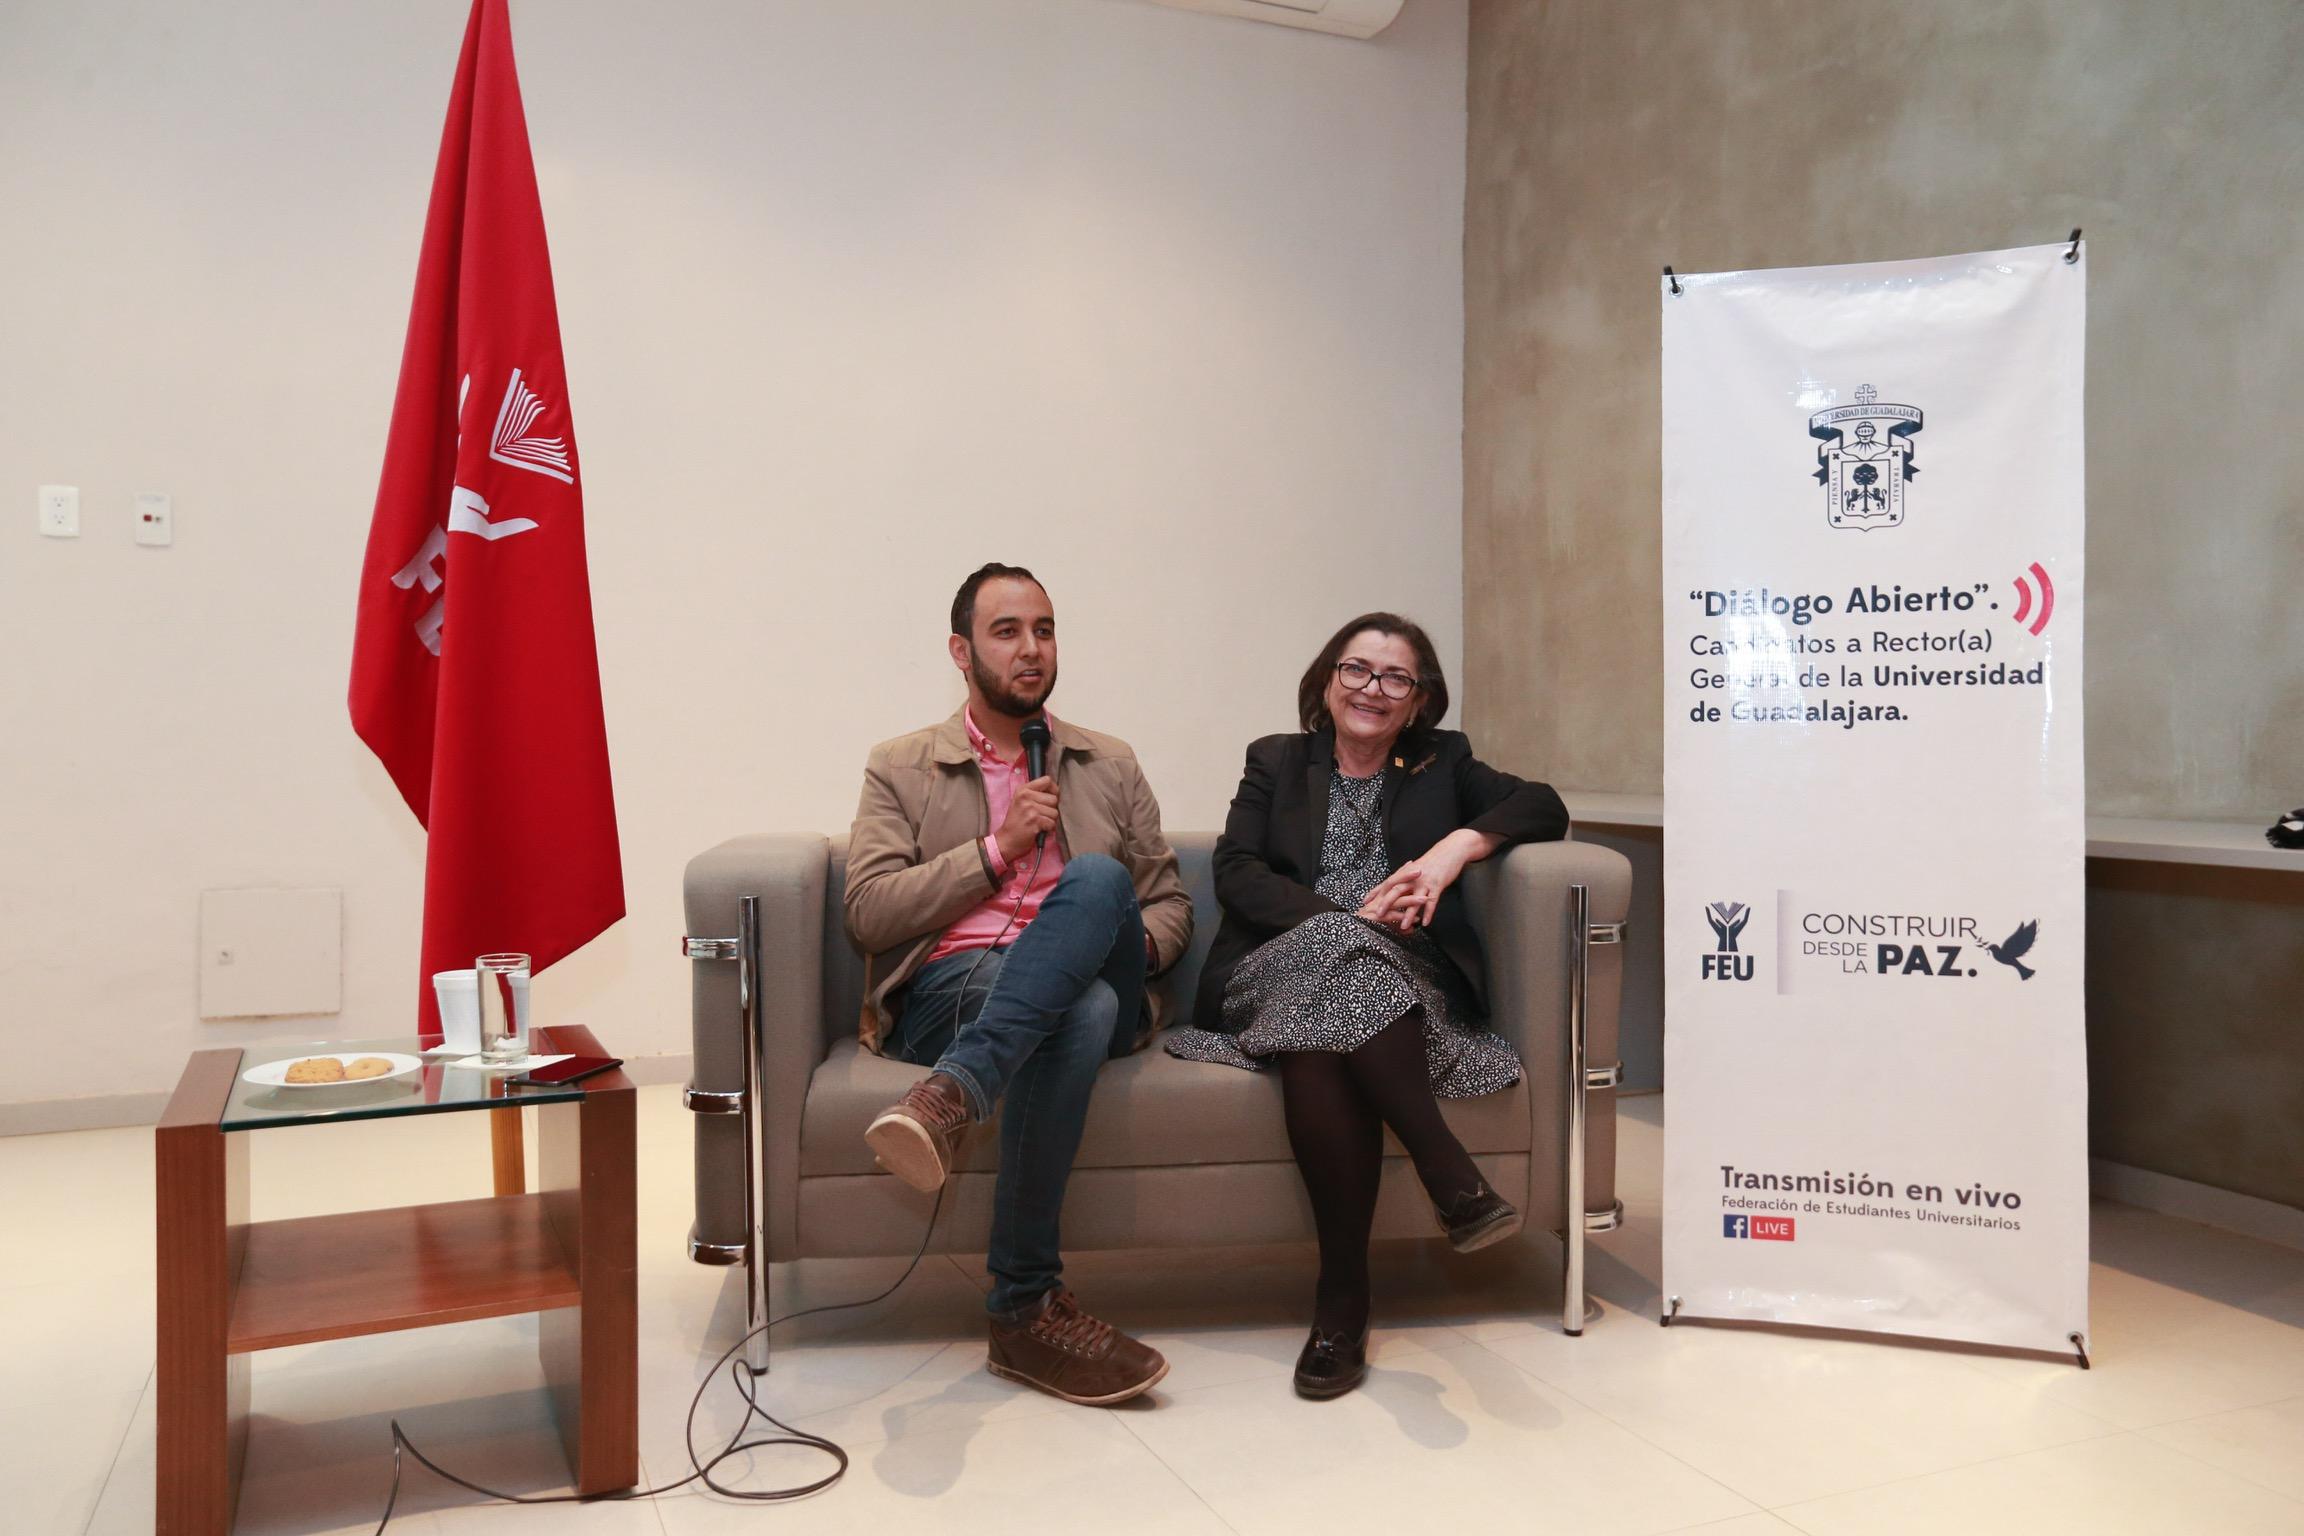 El Presidente de la FEU, Jesús Medina Varela entrevistó a la doctora Ruth Padilla